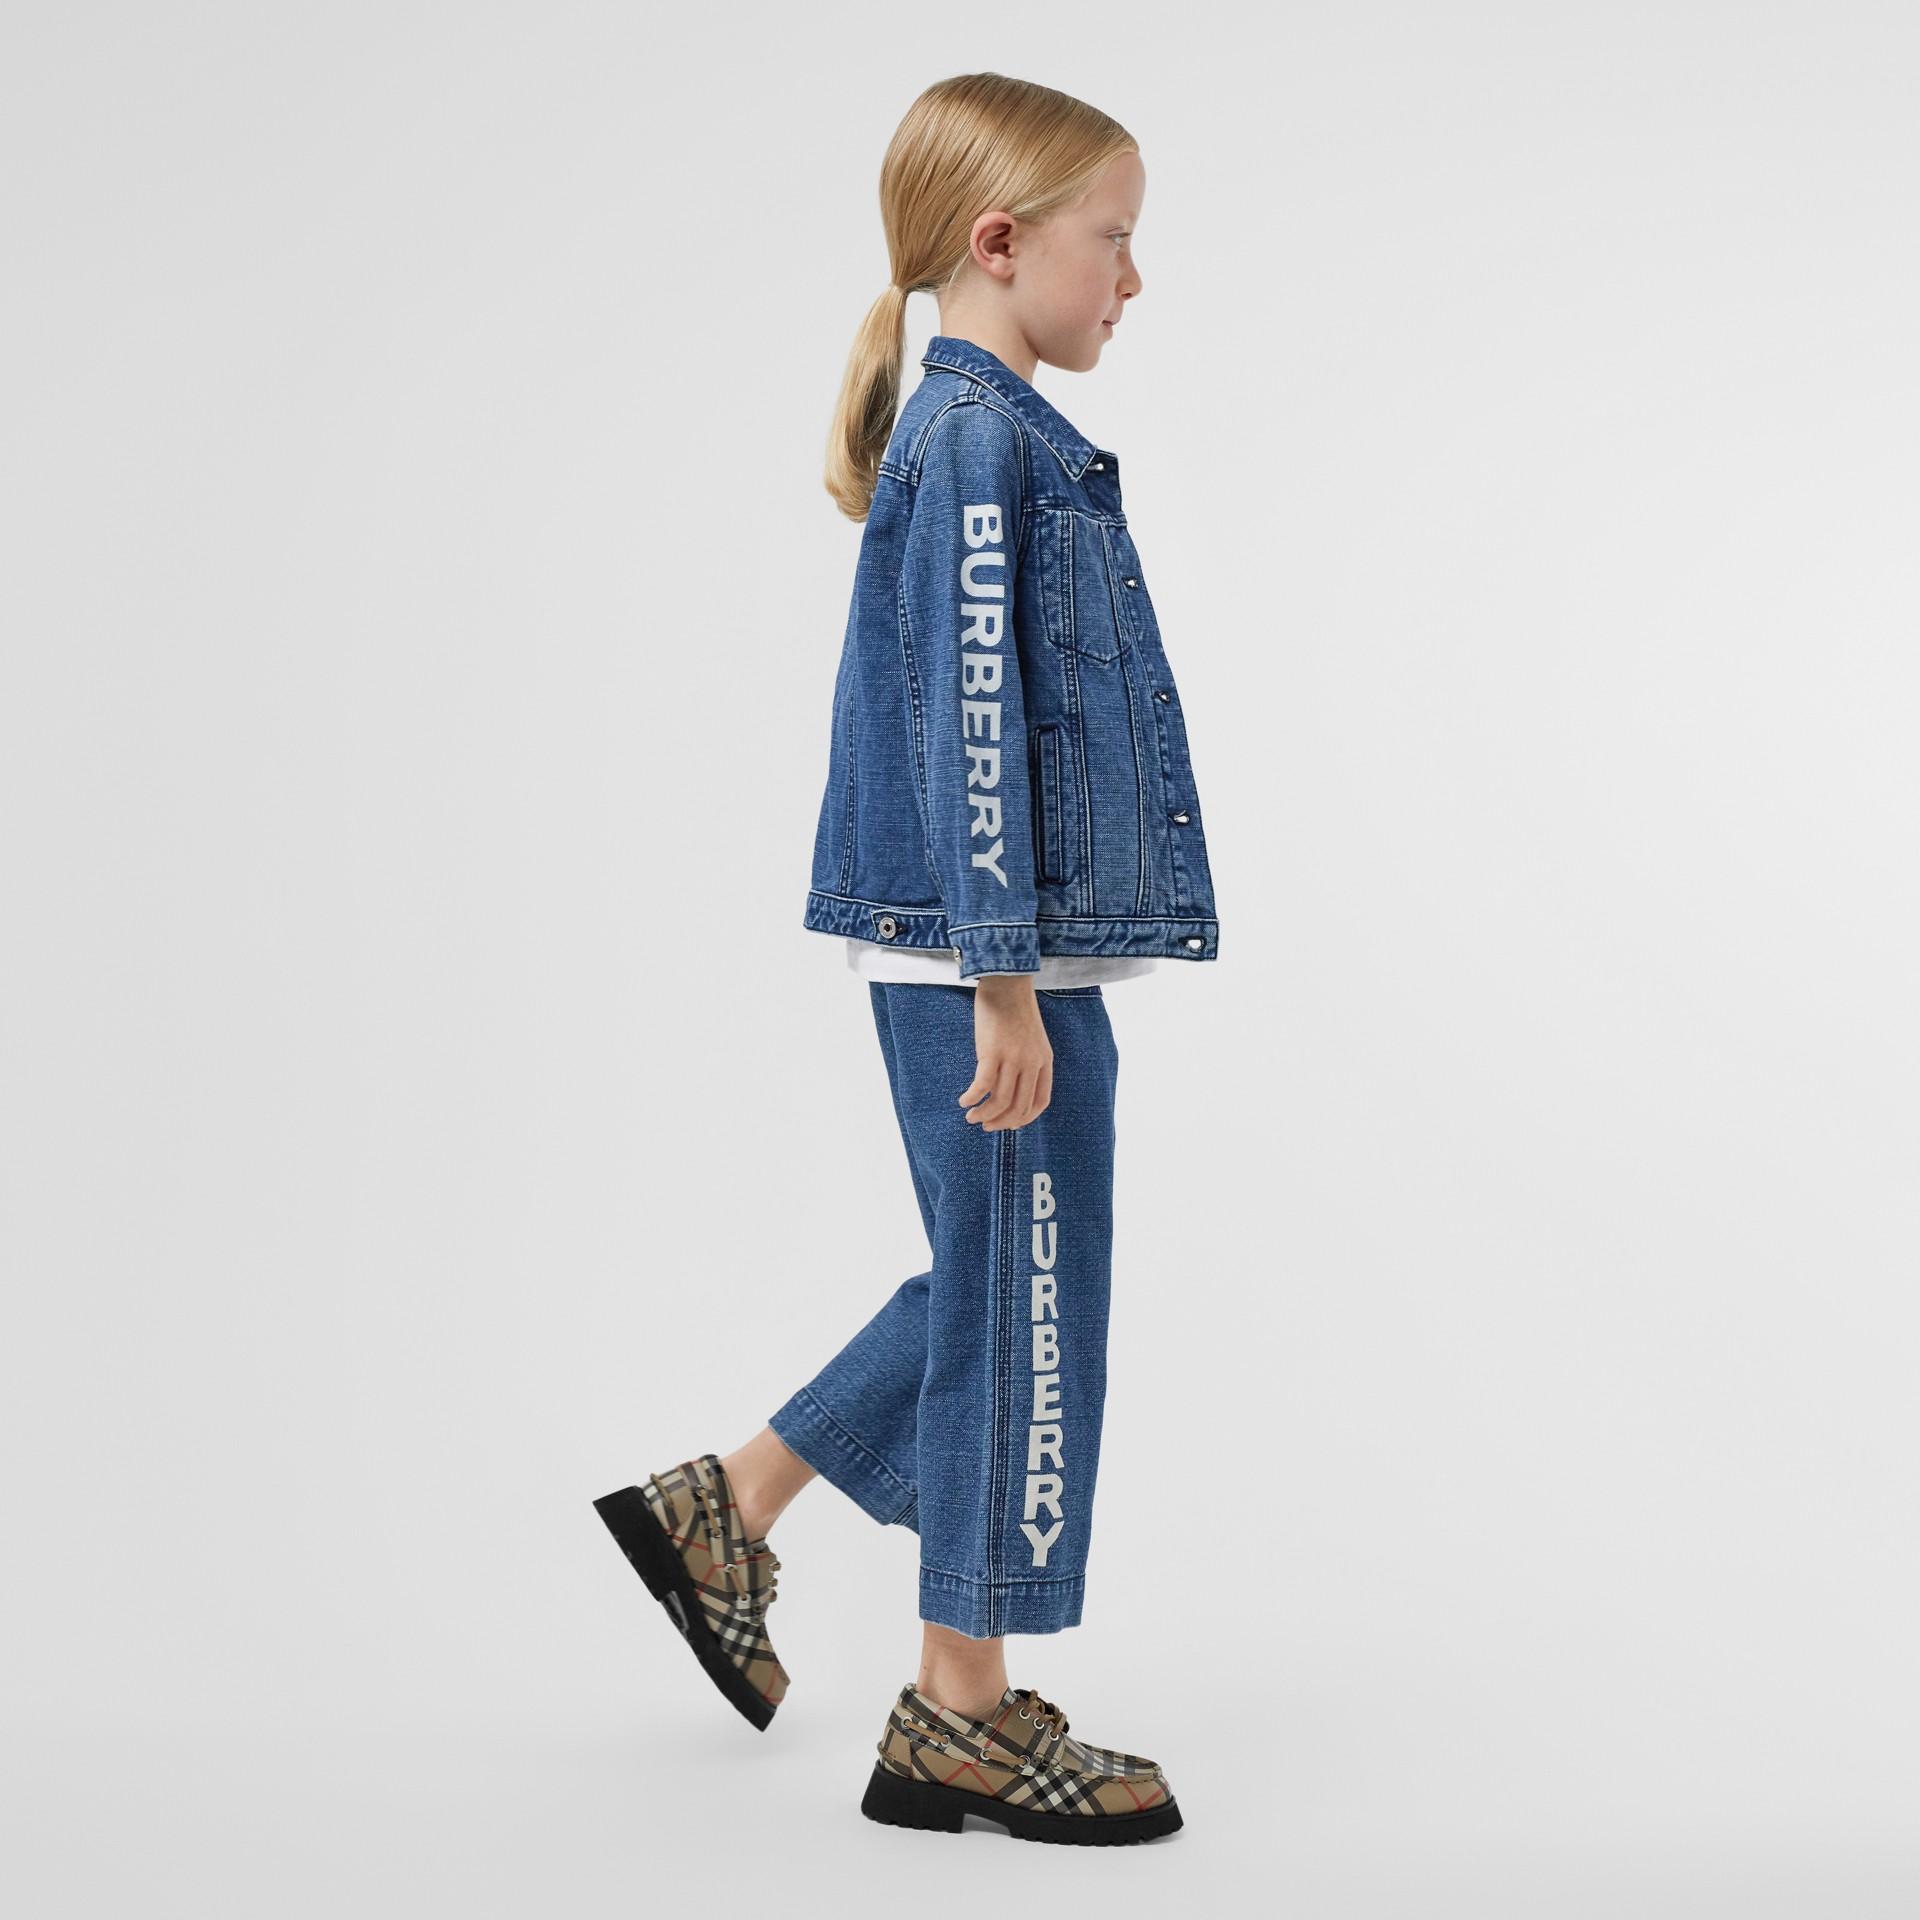 Logo Print Japanese Denim Jeans in Indigo - Girl   Burberry - gallery image 2